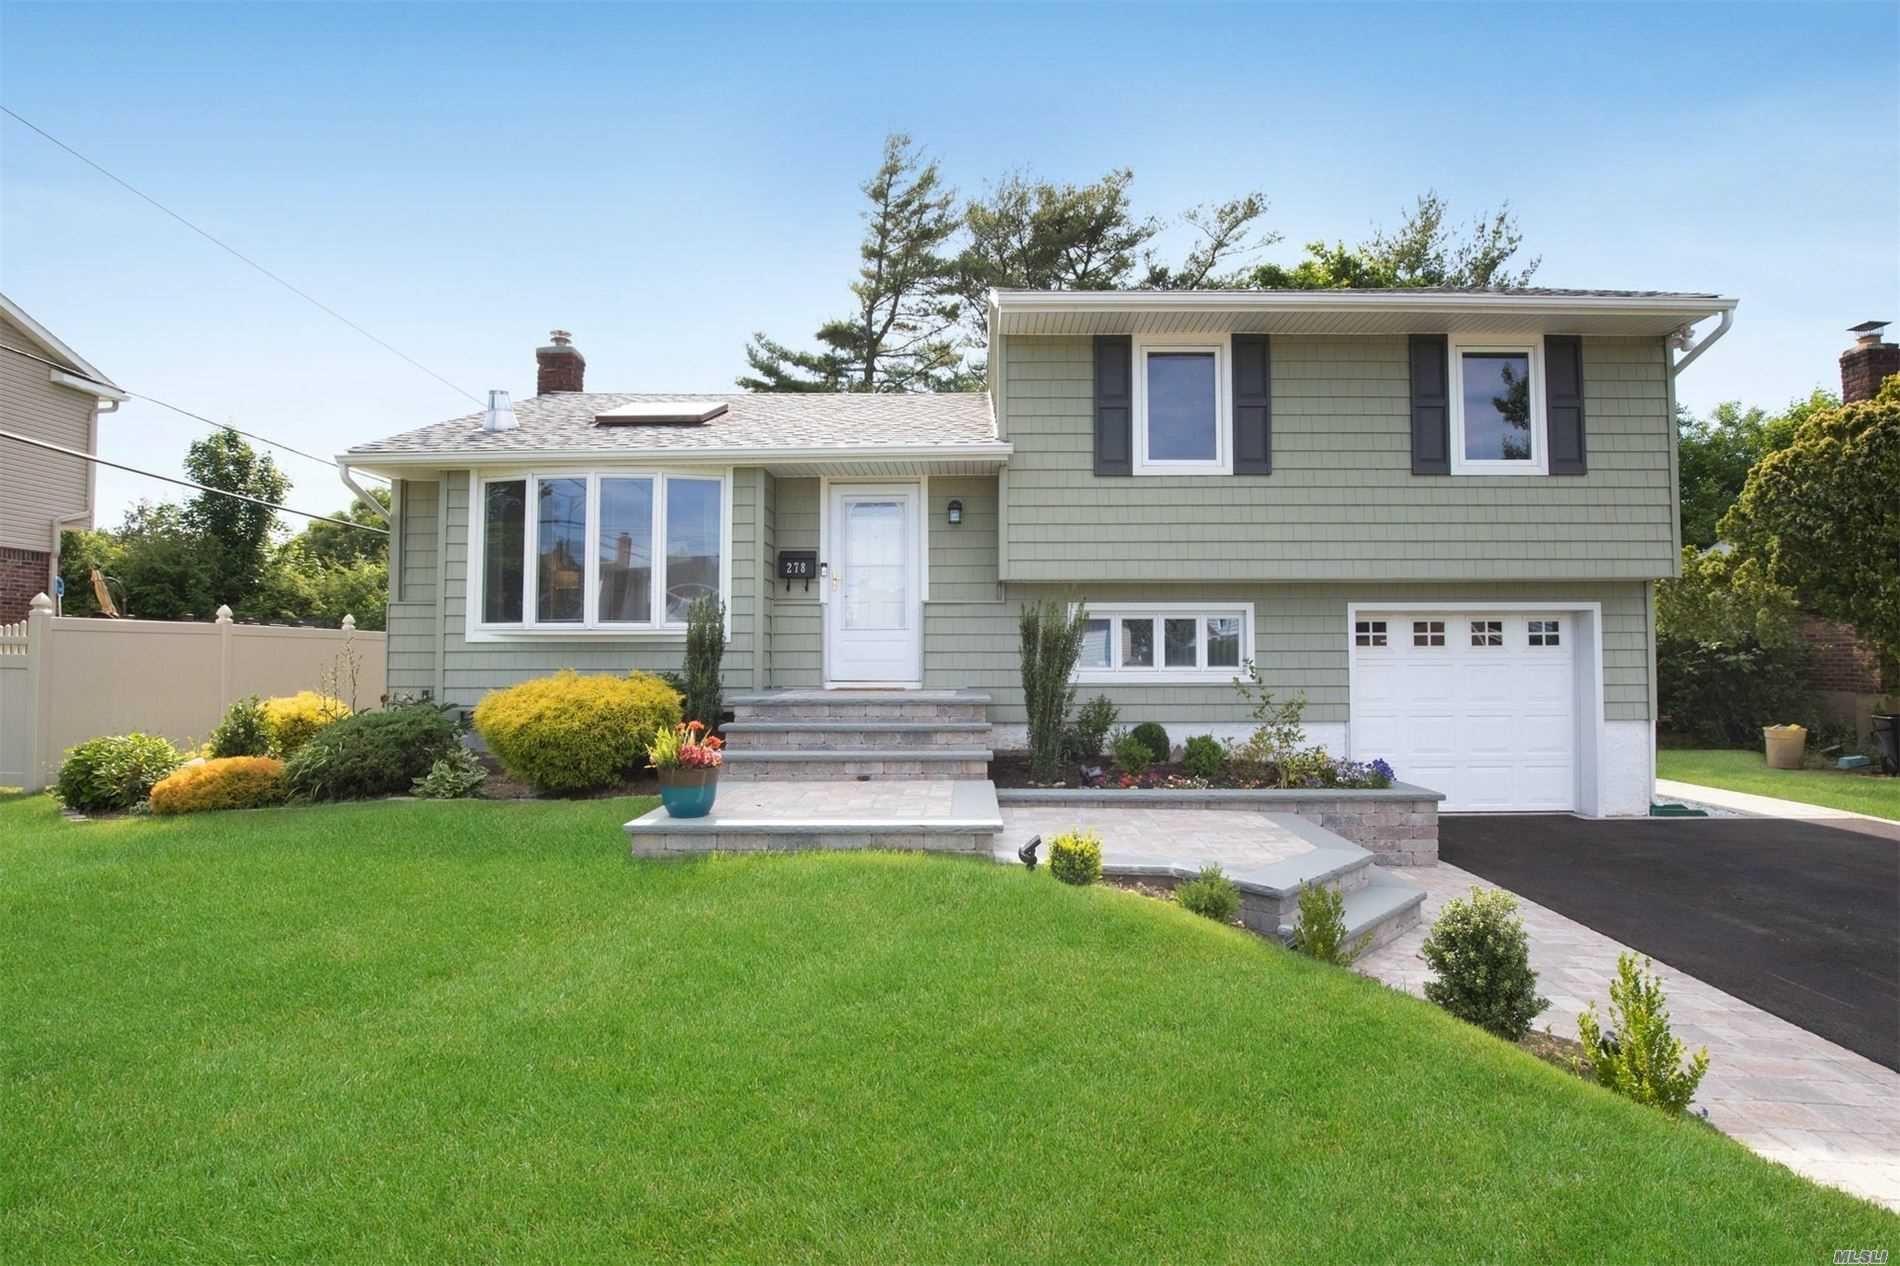 278 Southwood Cir, Syosset, NY 11791 - MLS#: 3223196